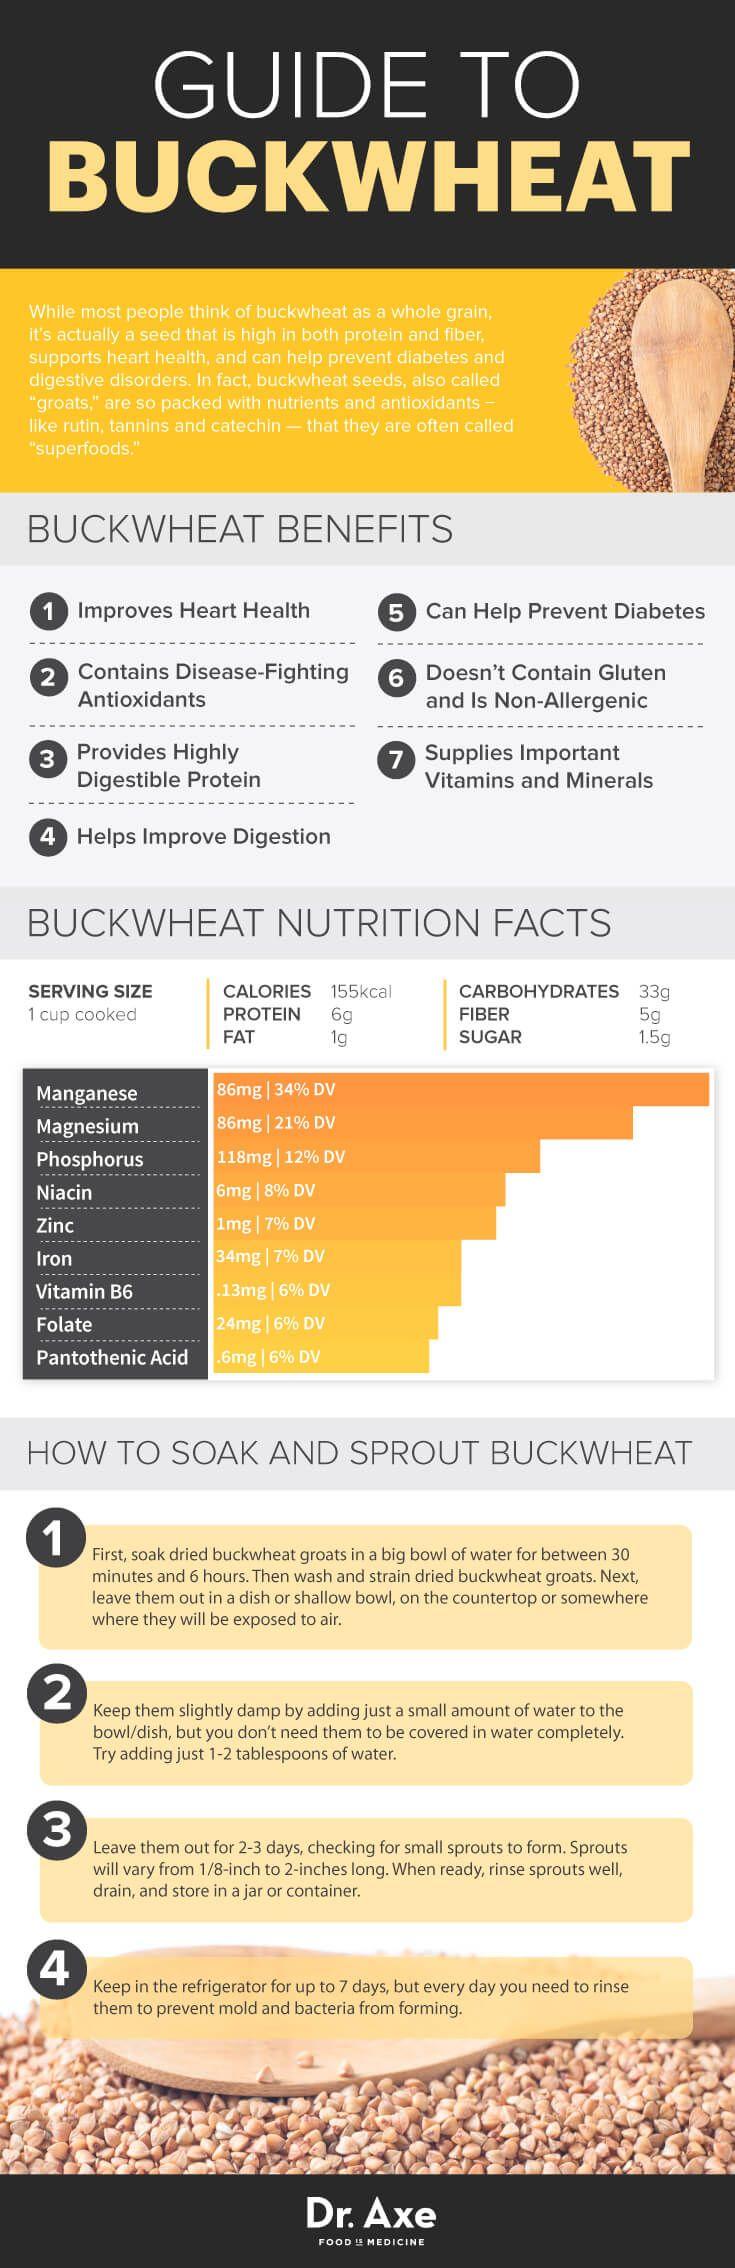 Buckwheat Nutrition & Health Benefits - Dr. Axe